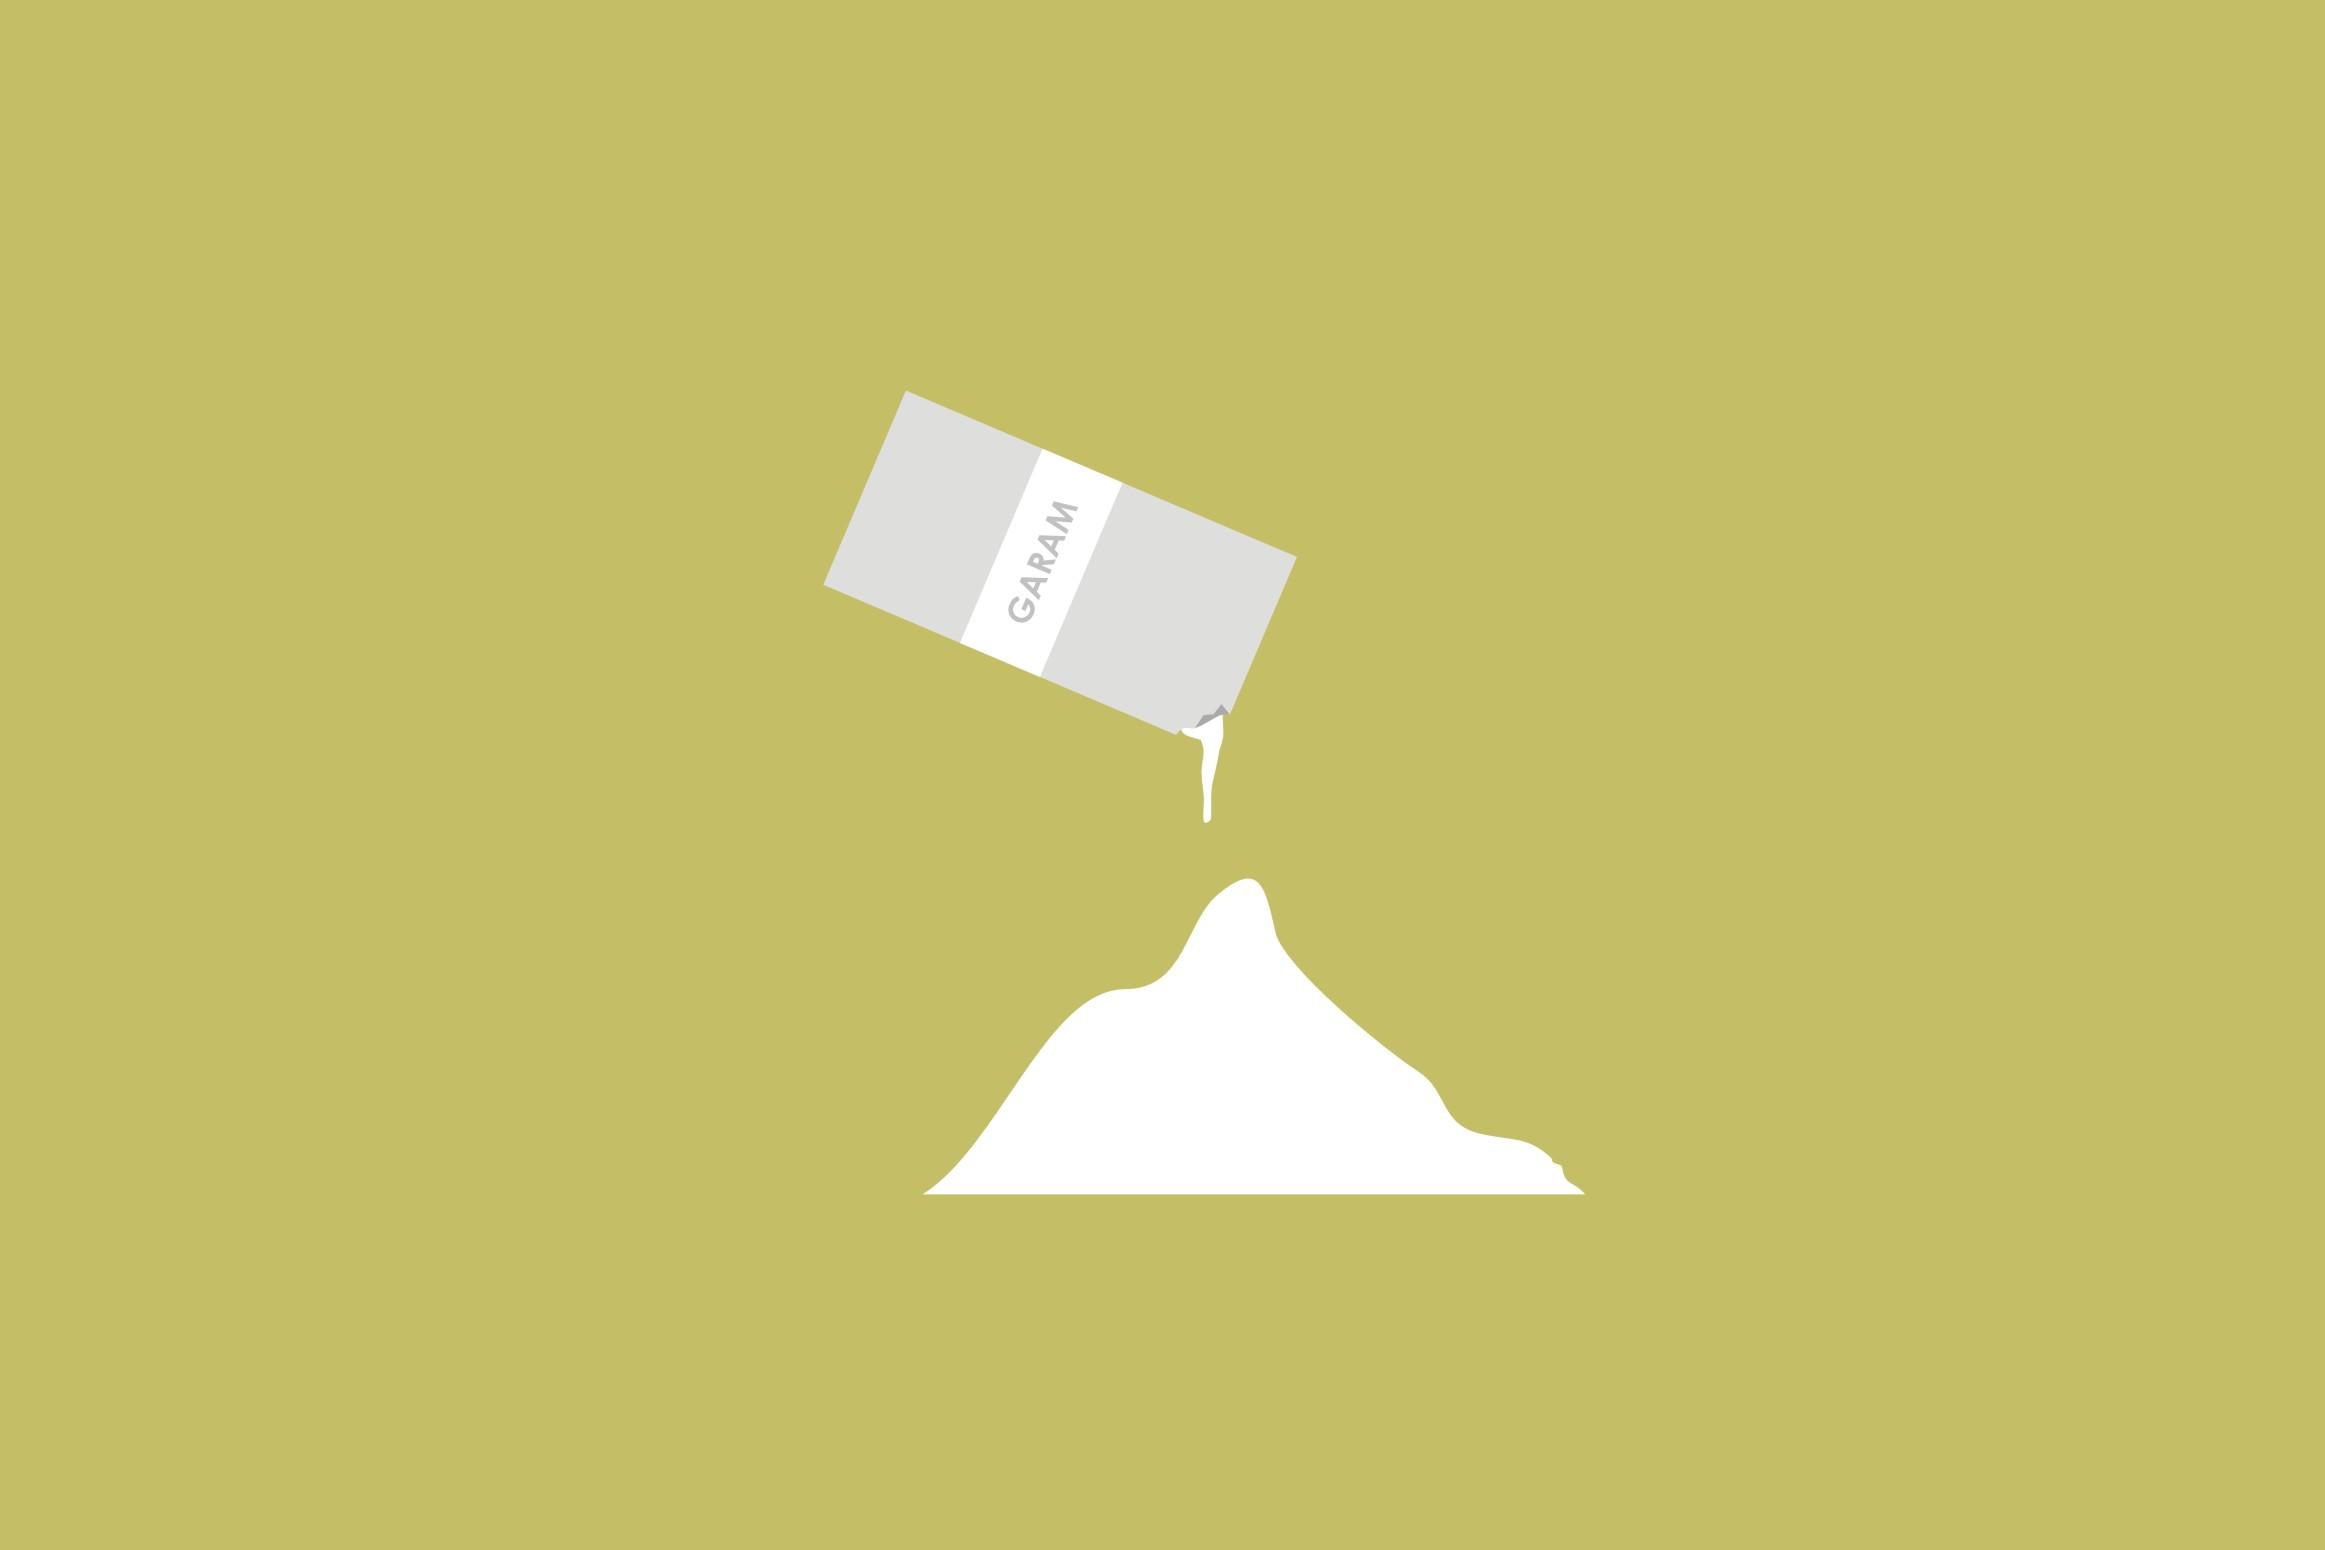 5 Makanan ini kandungan garamnya tinggi tapi tak pernah kamu sadari